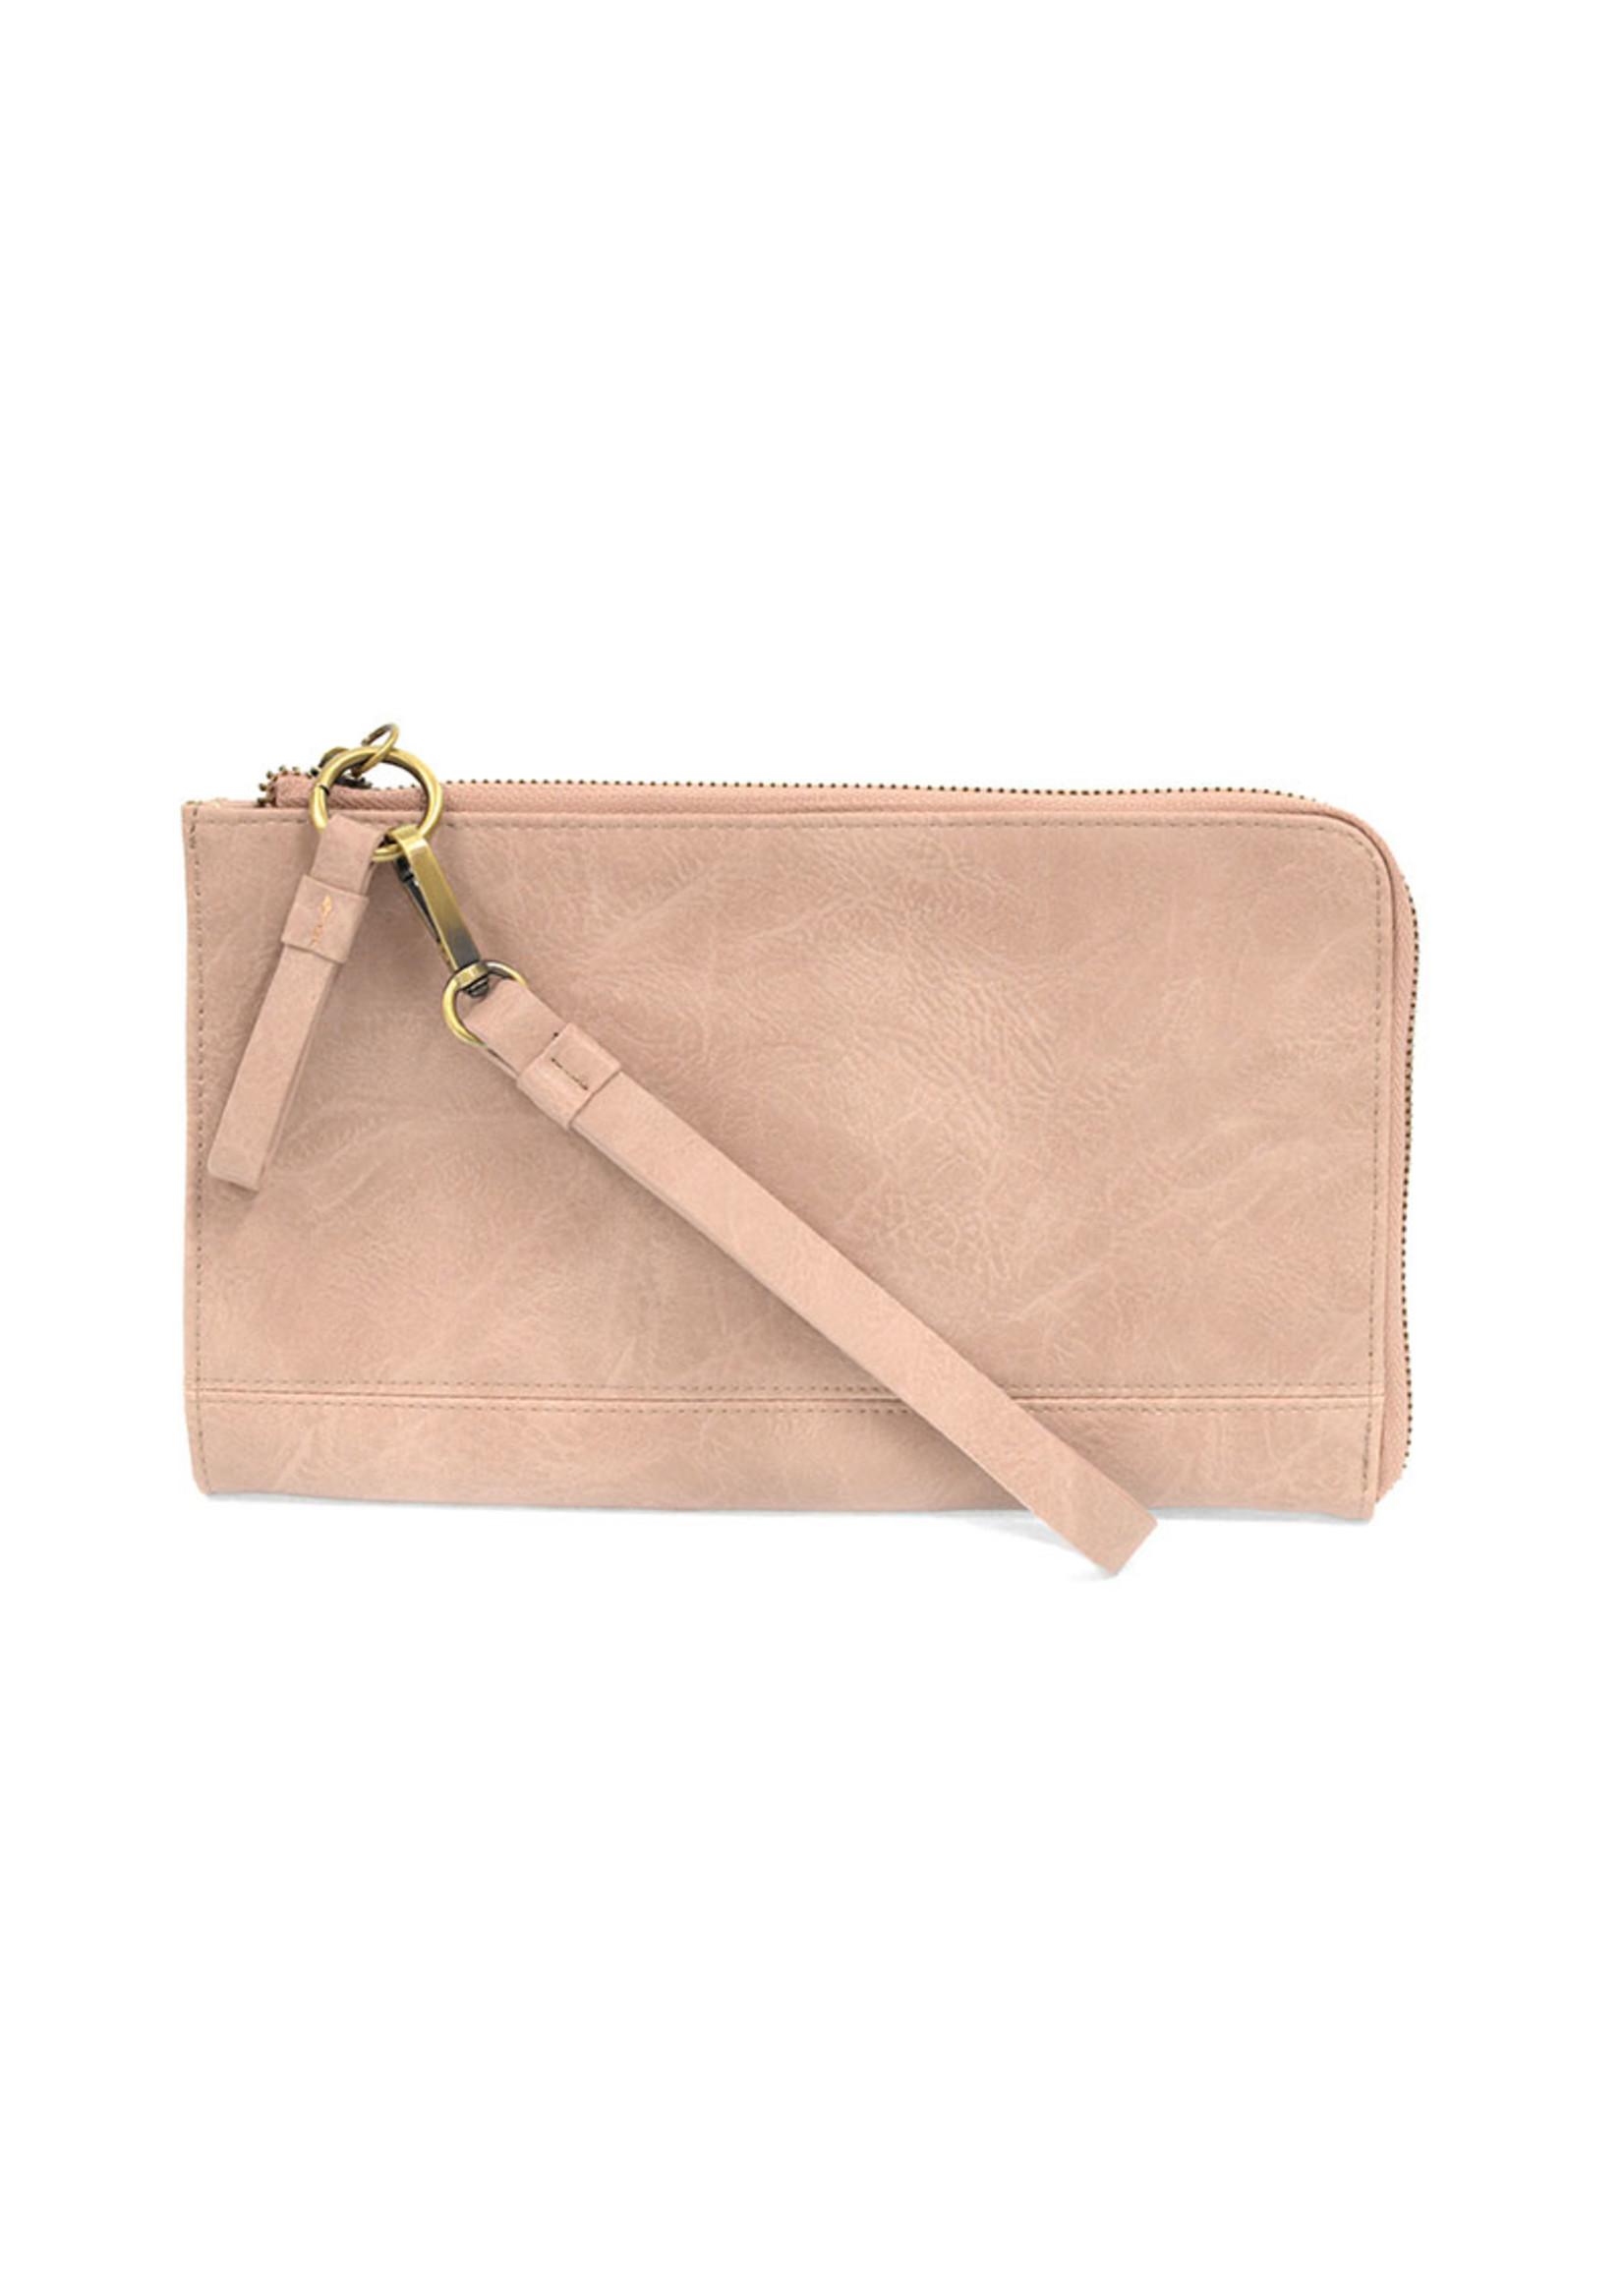 Joy Susan Karina Convertible Wristlet & Wallet